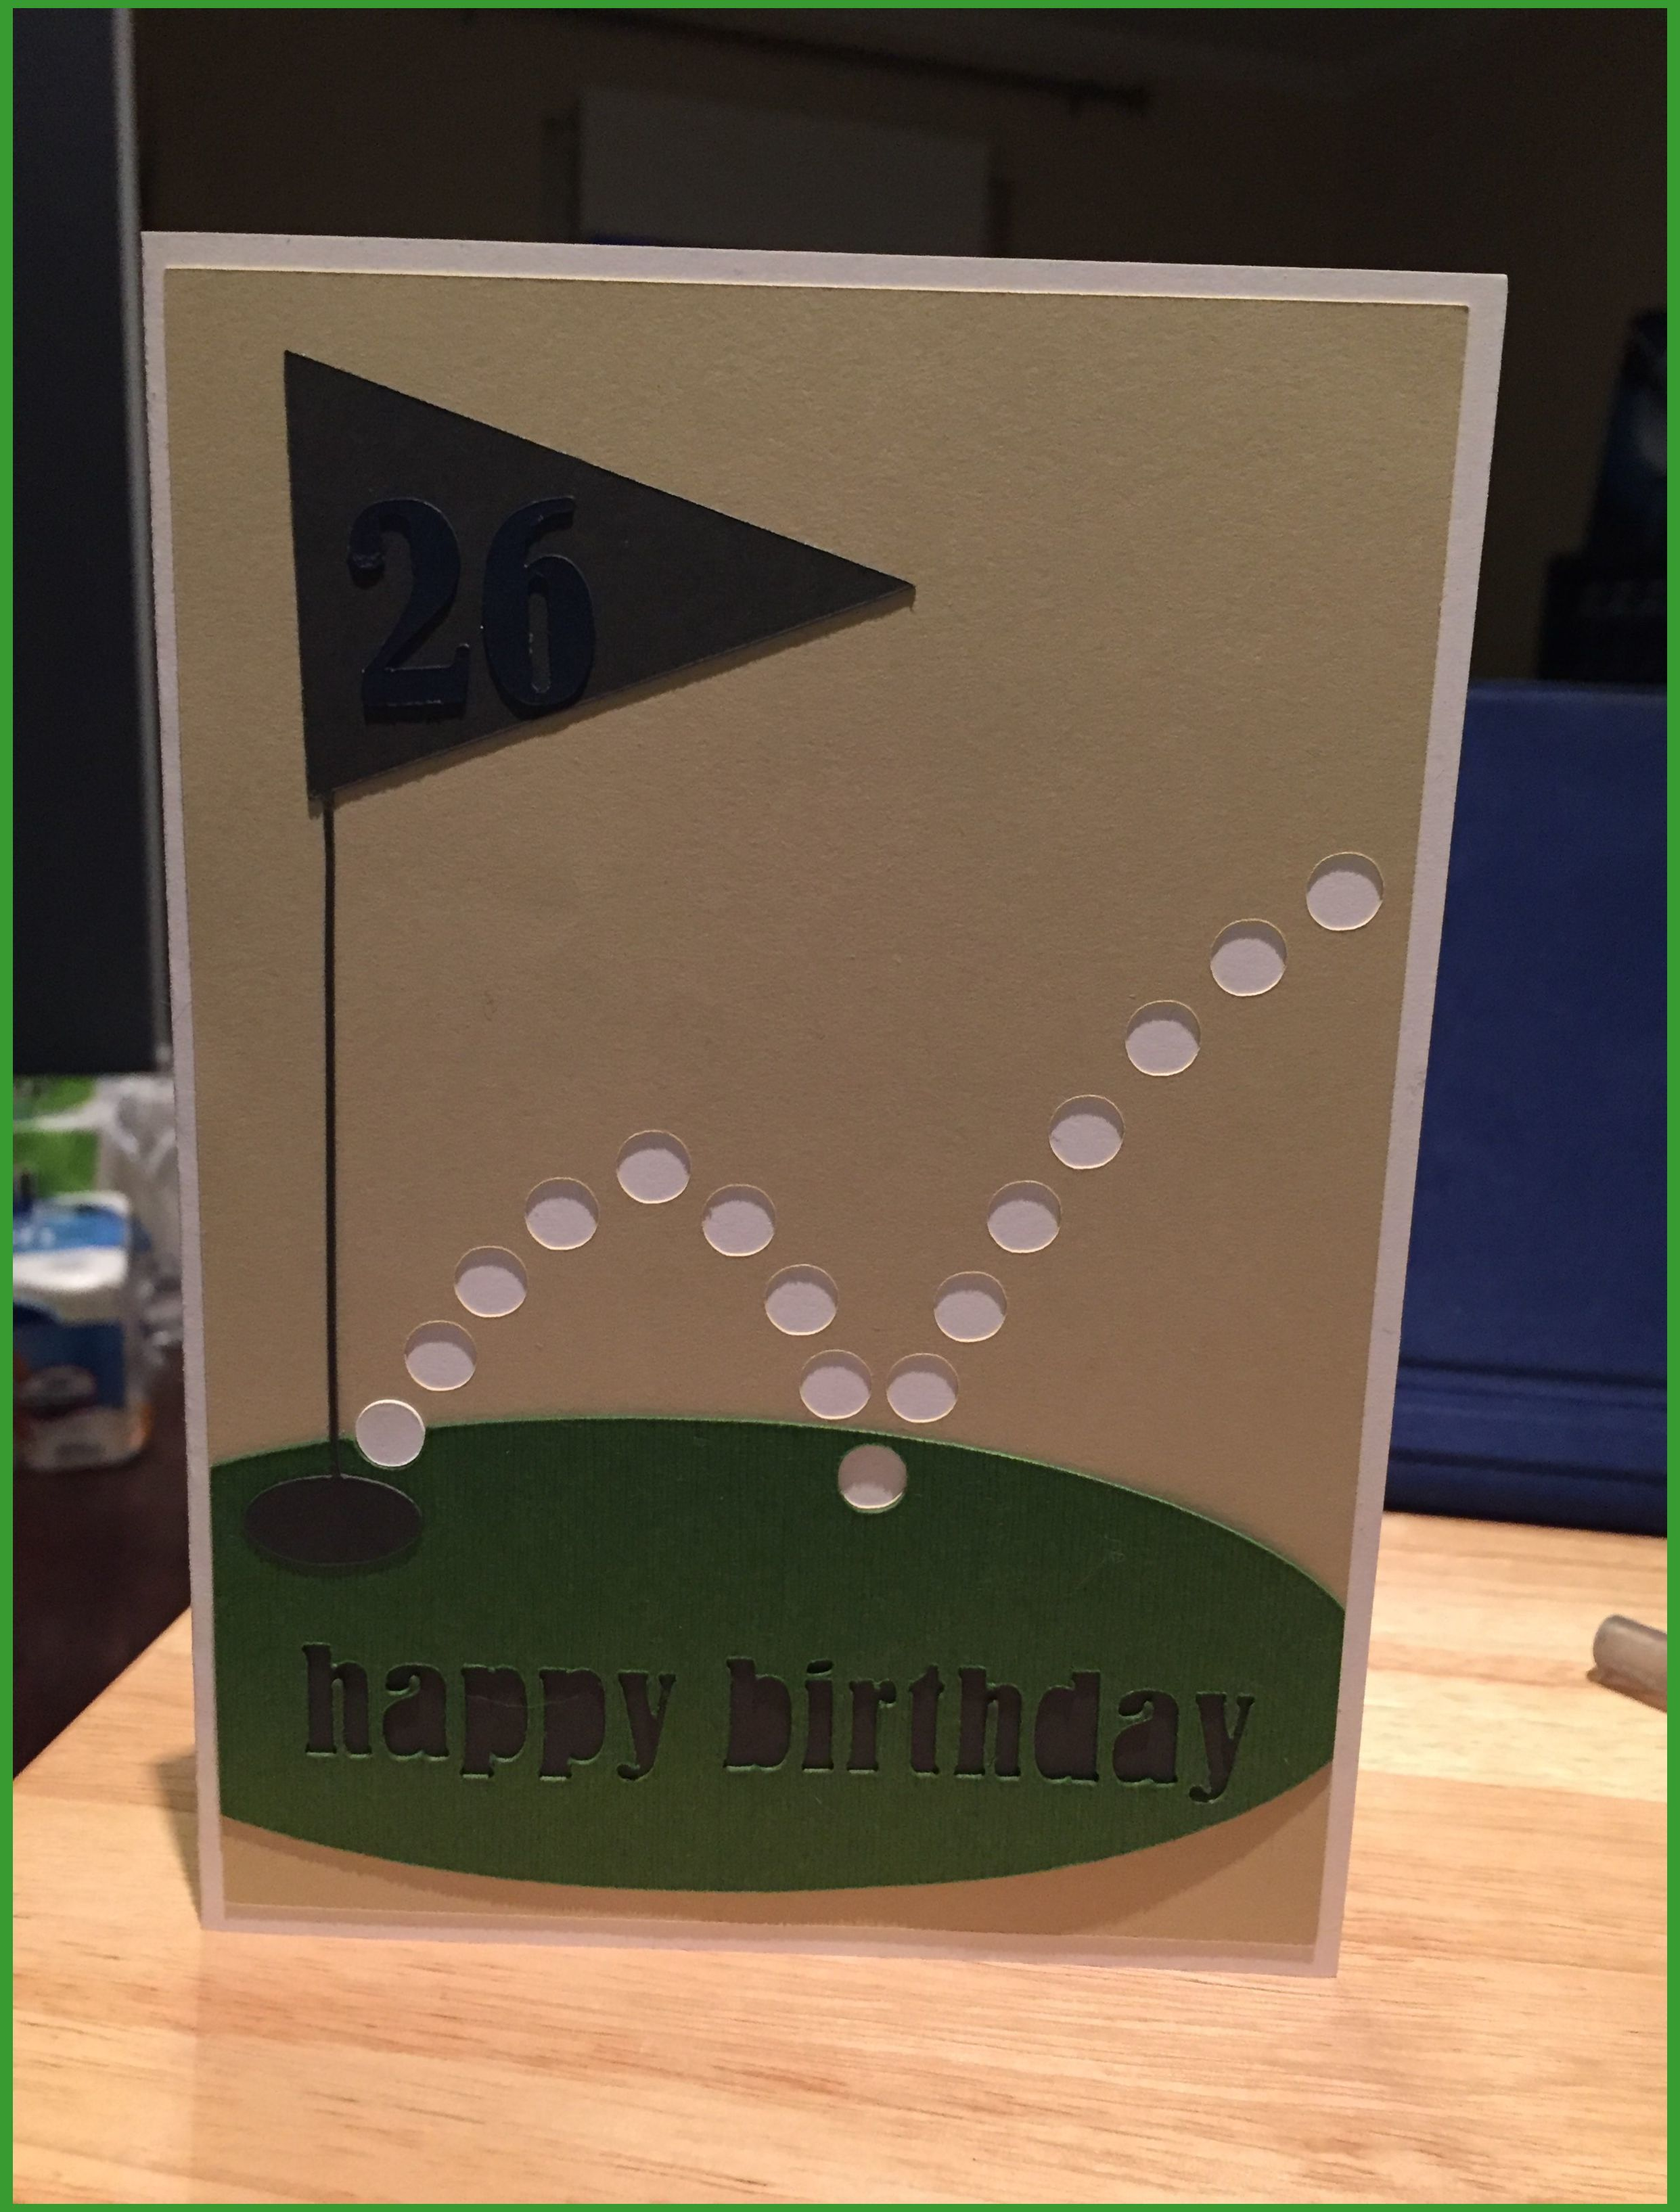 Golf Birthday Card Diy Golf Training Diy Golf Training Swings Golf School Budget Frie Homemade Birthday Cards Golf Birthday Cards Birthday Cards For Men